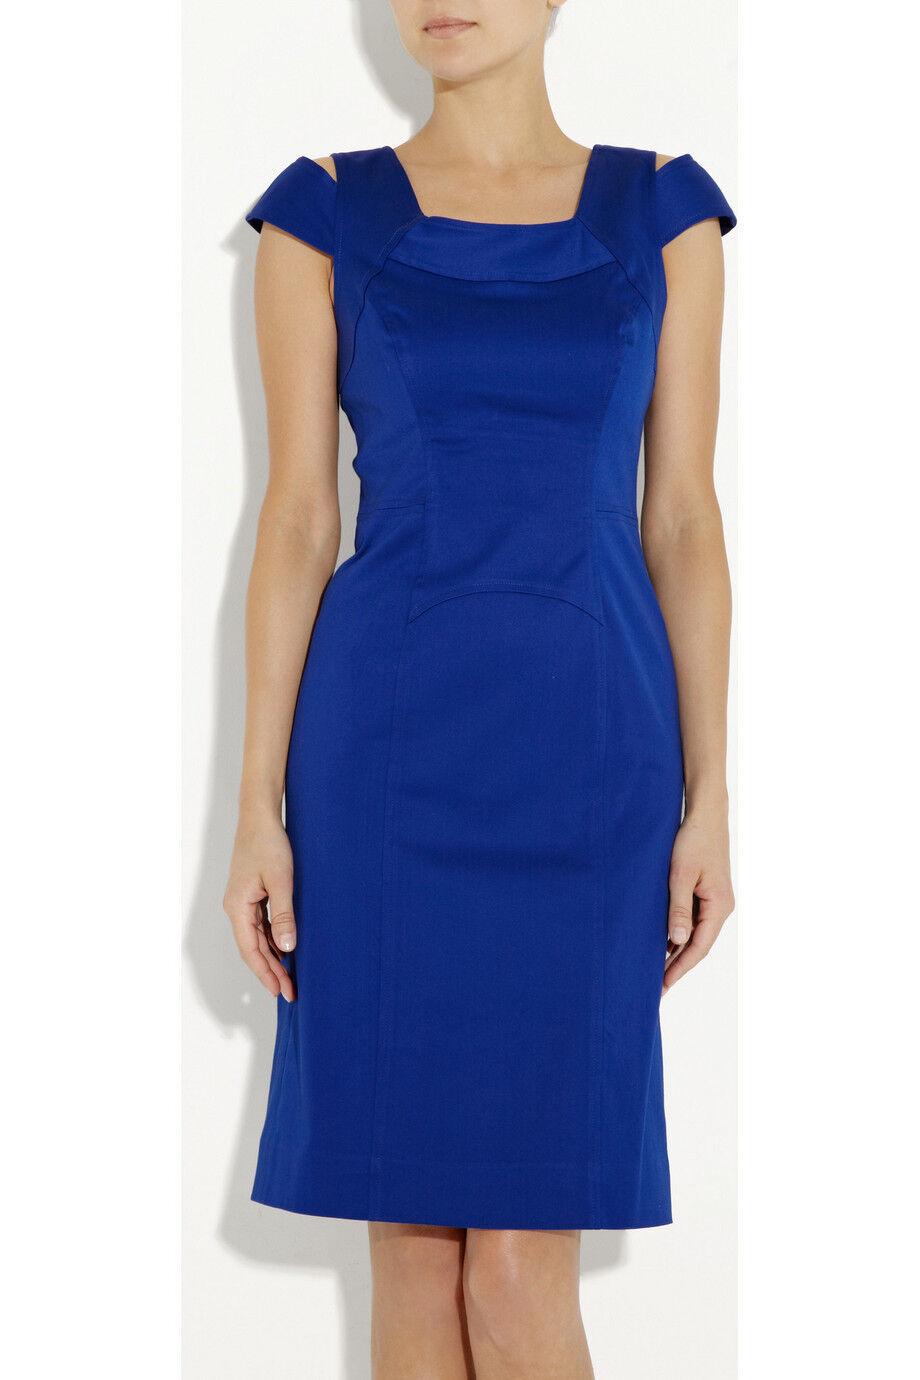 NWT Milly 'Keithly' Cobalt bluee Stretch Cotton Cotton Cotton Dress - US 2, AU 8 e8e7c6